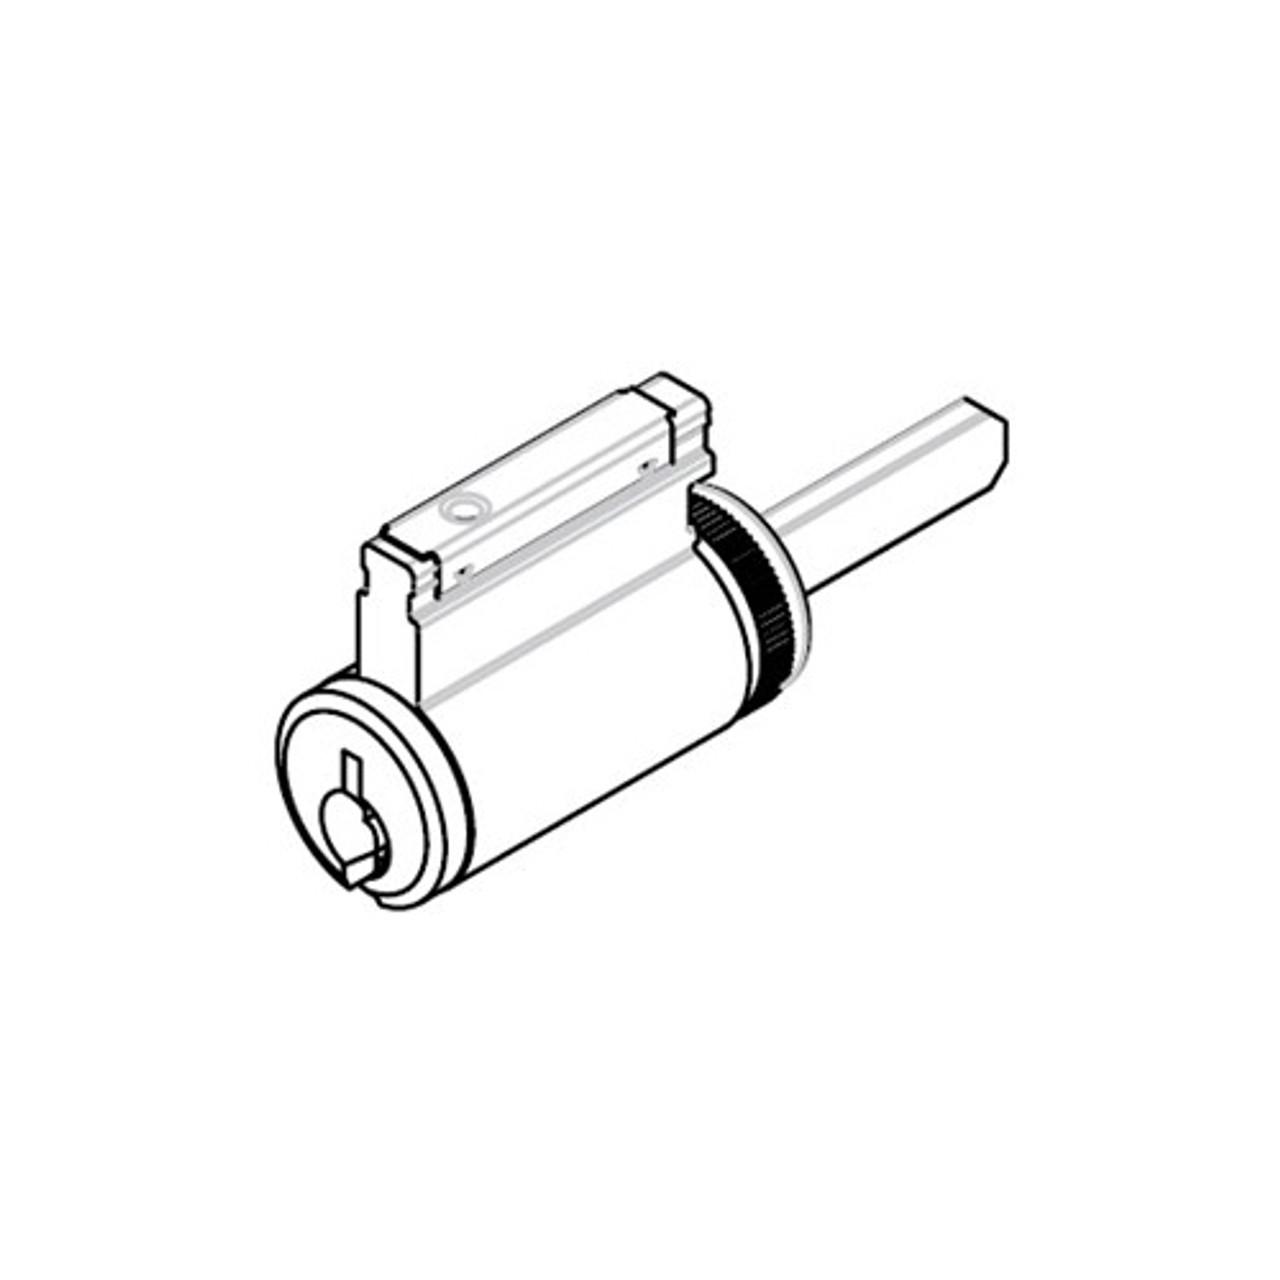 CR2000-033-59D1-626 Corbin Russwin Conventional Key in